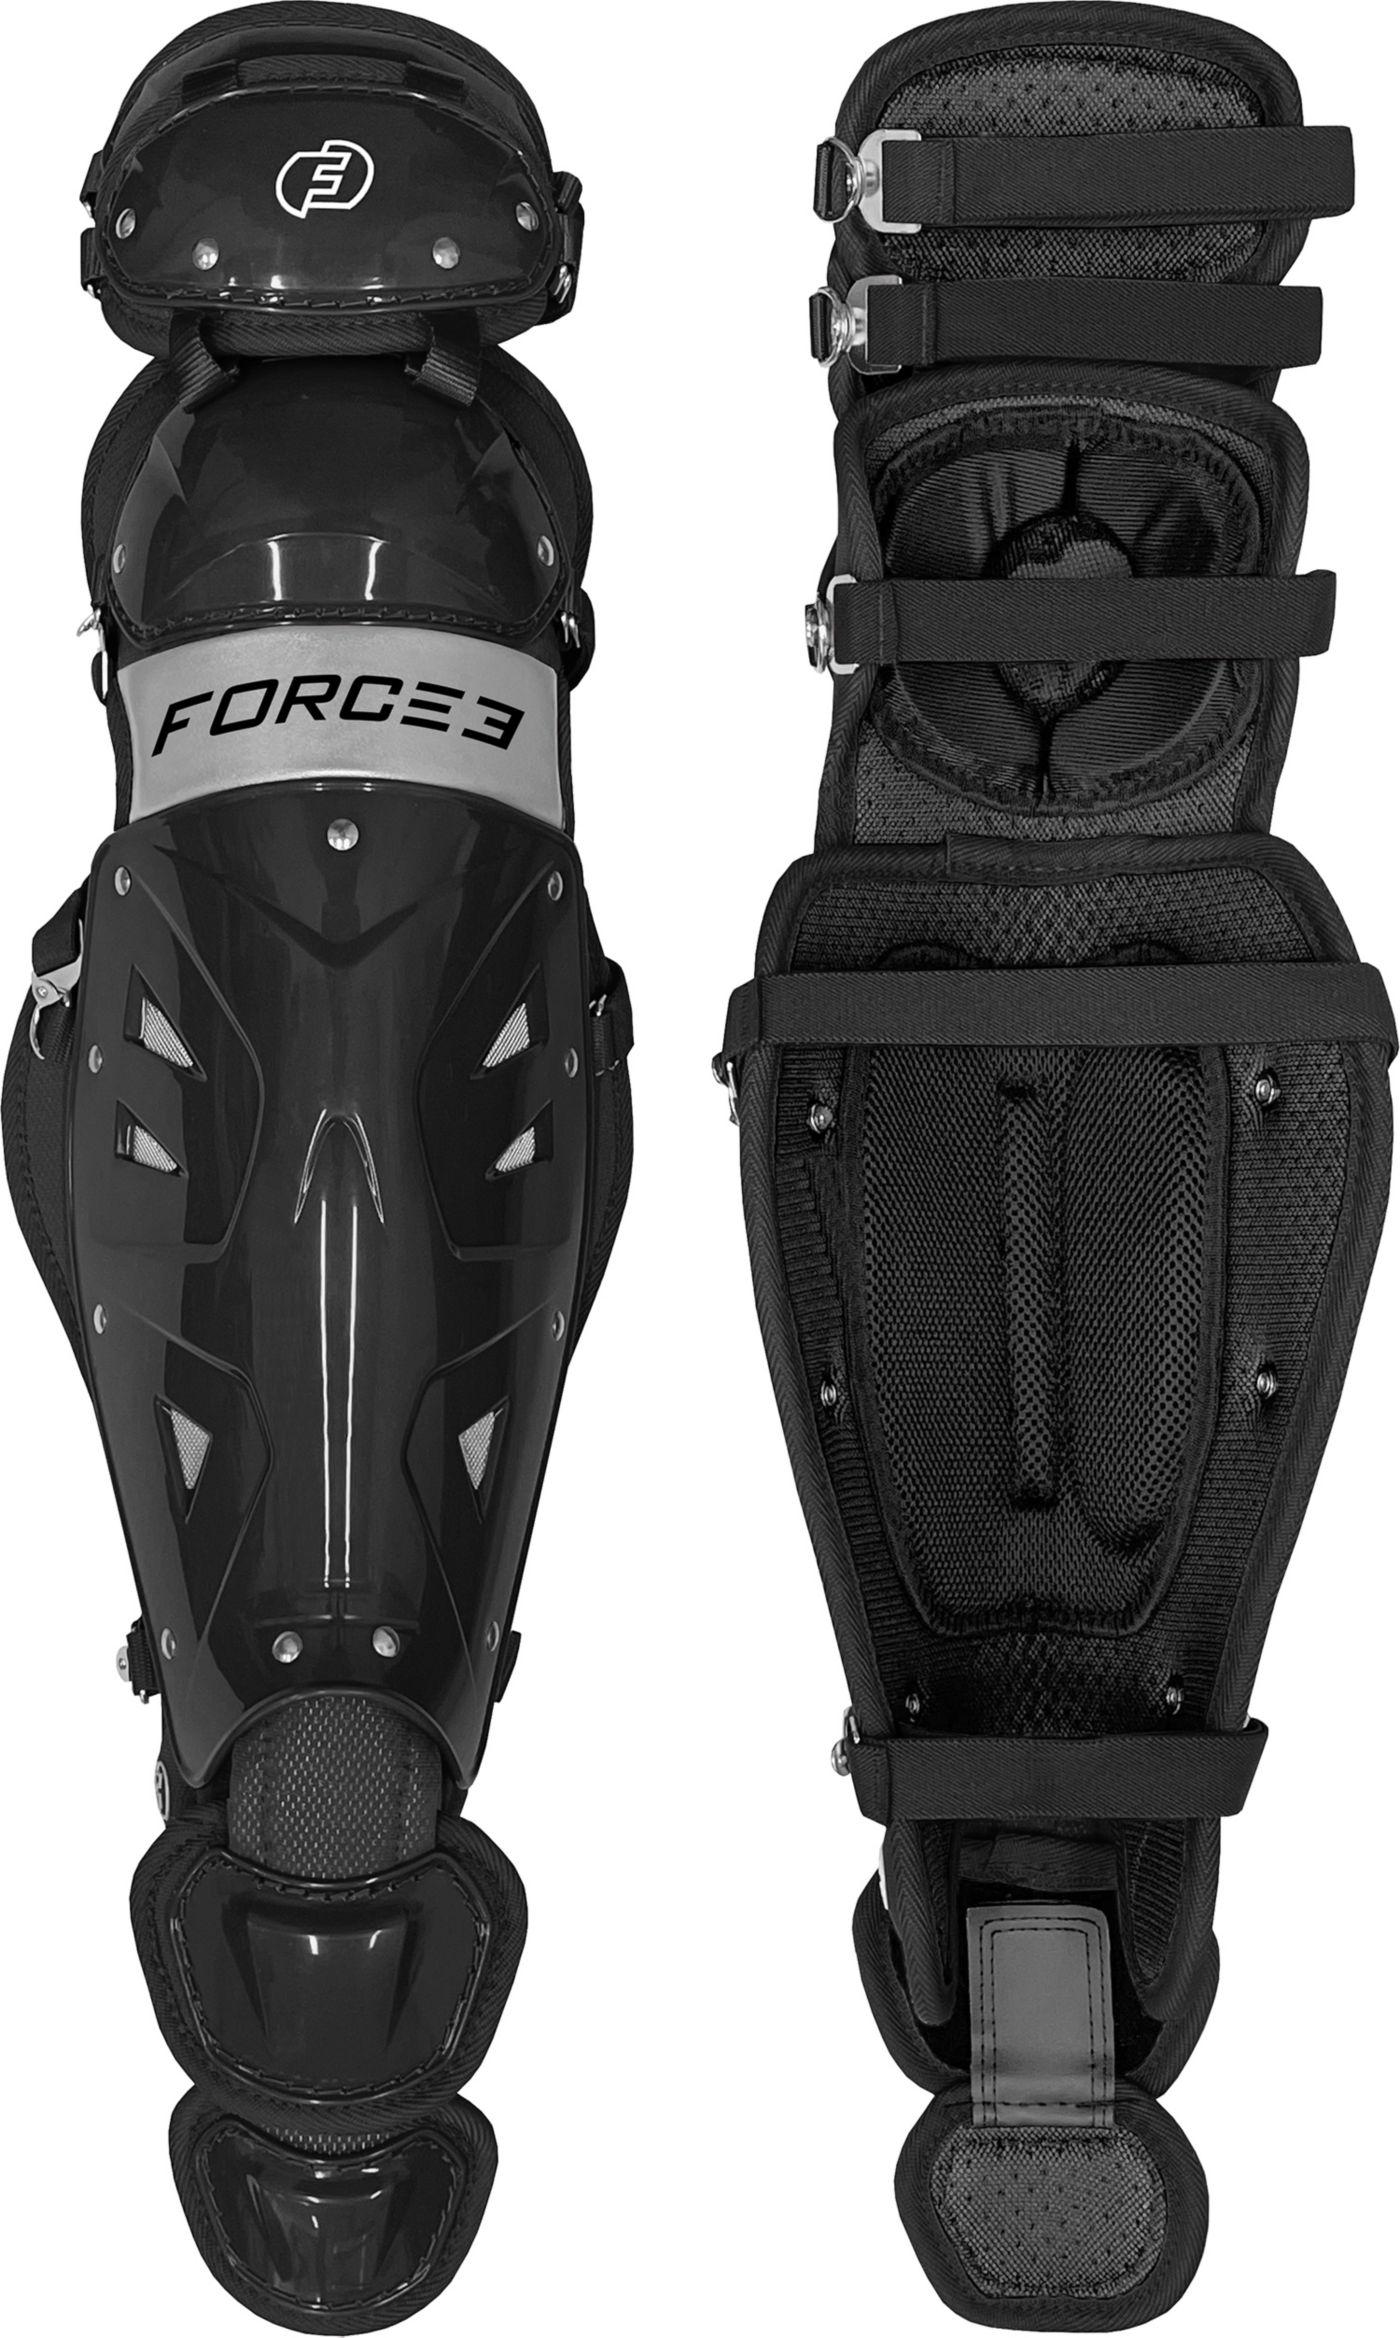 Force3 Pro Gear Adult 19.5'' Leg Guards